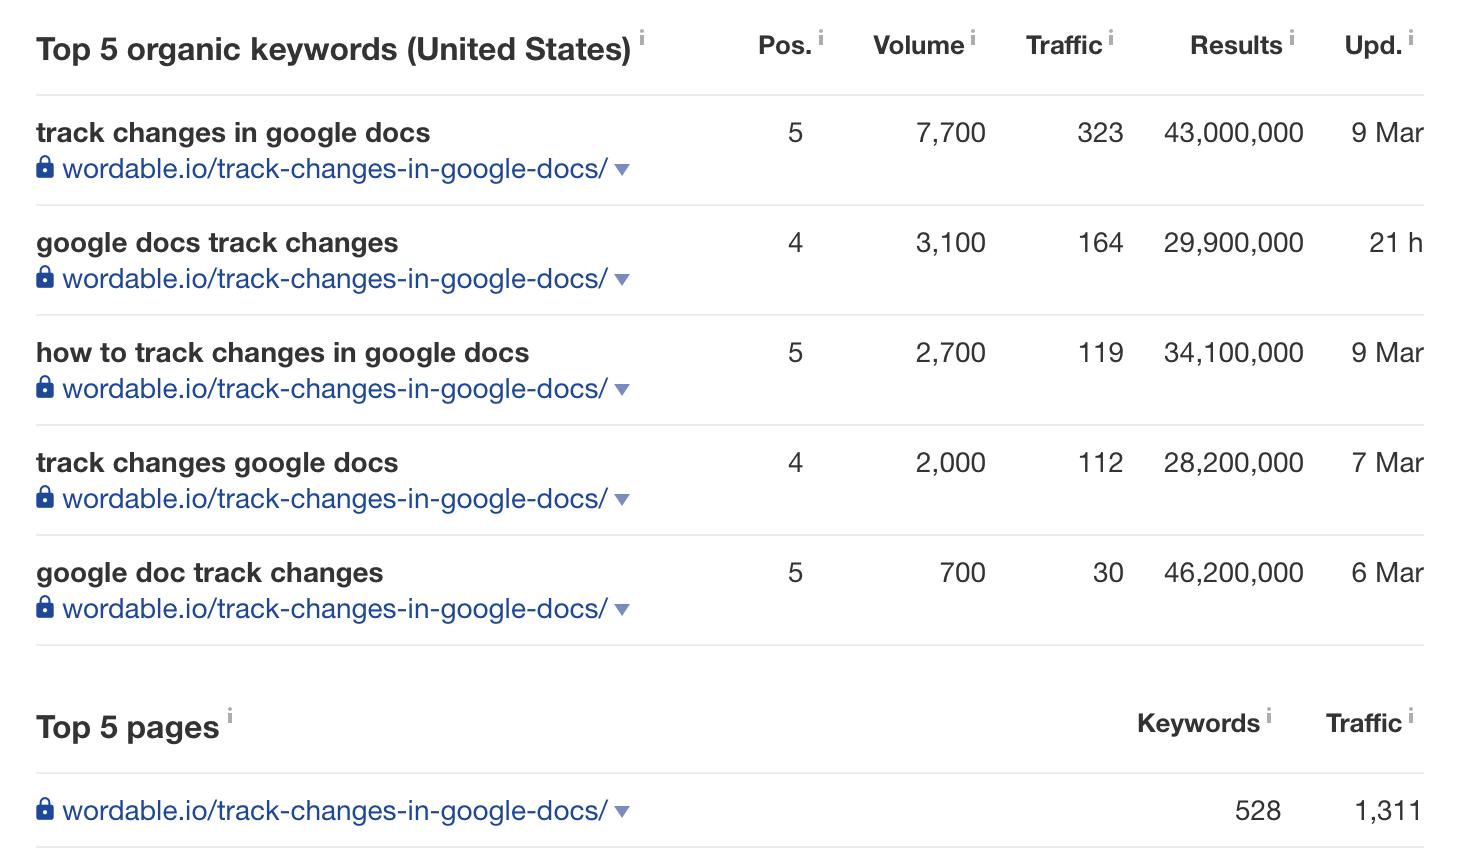 sample top 5 organic keywords (US)